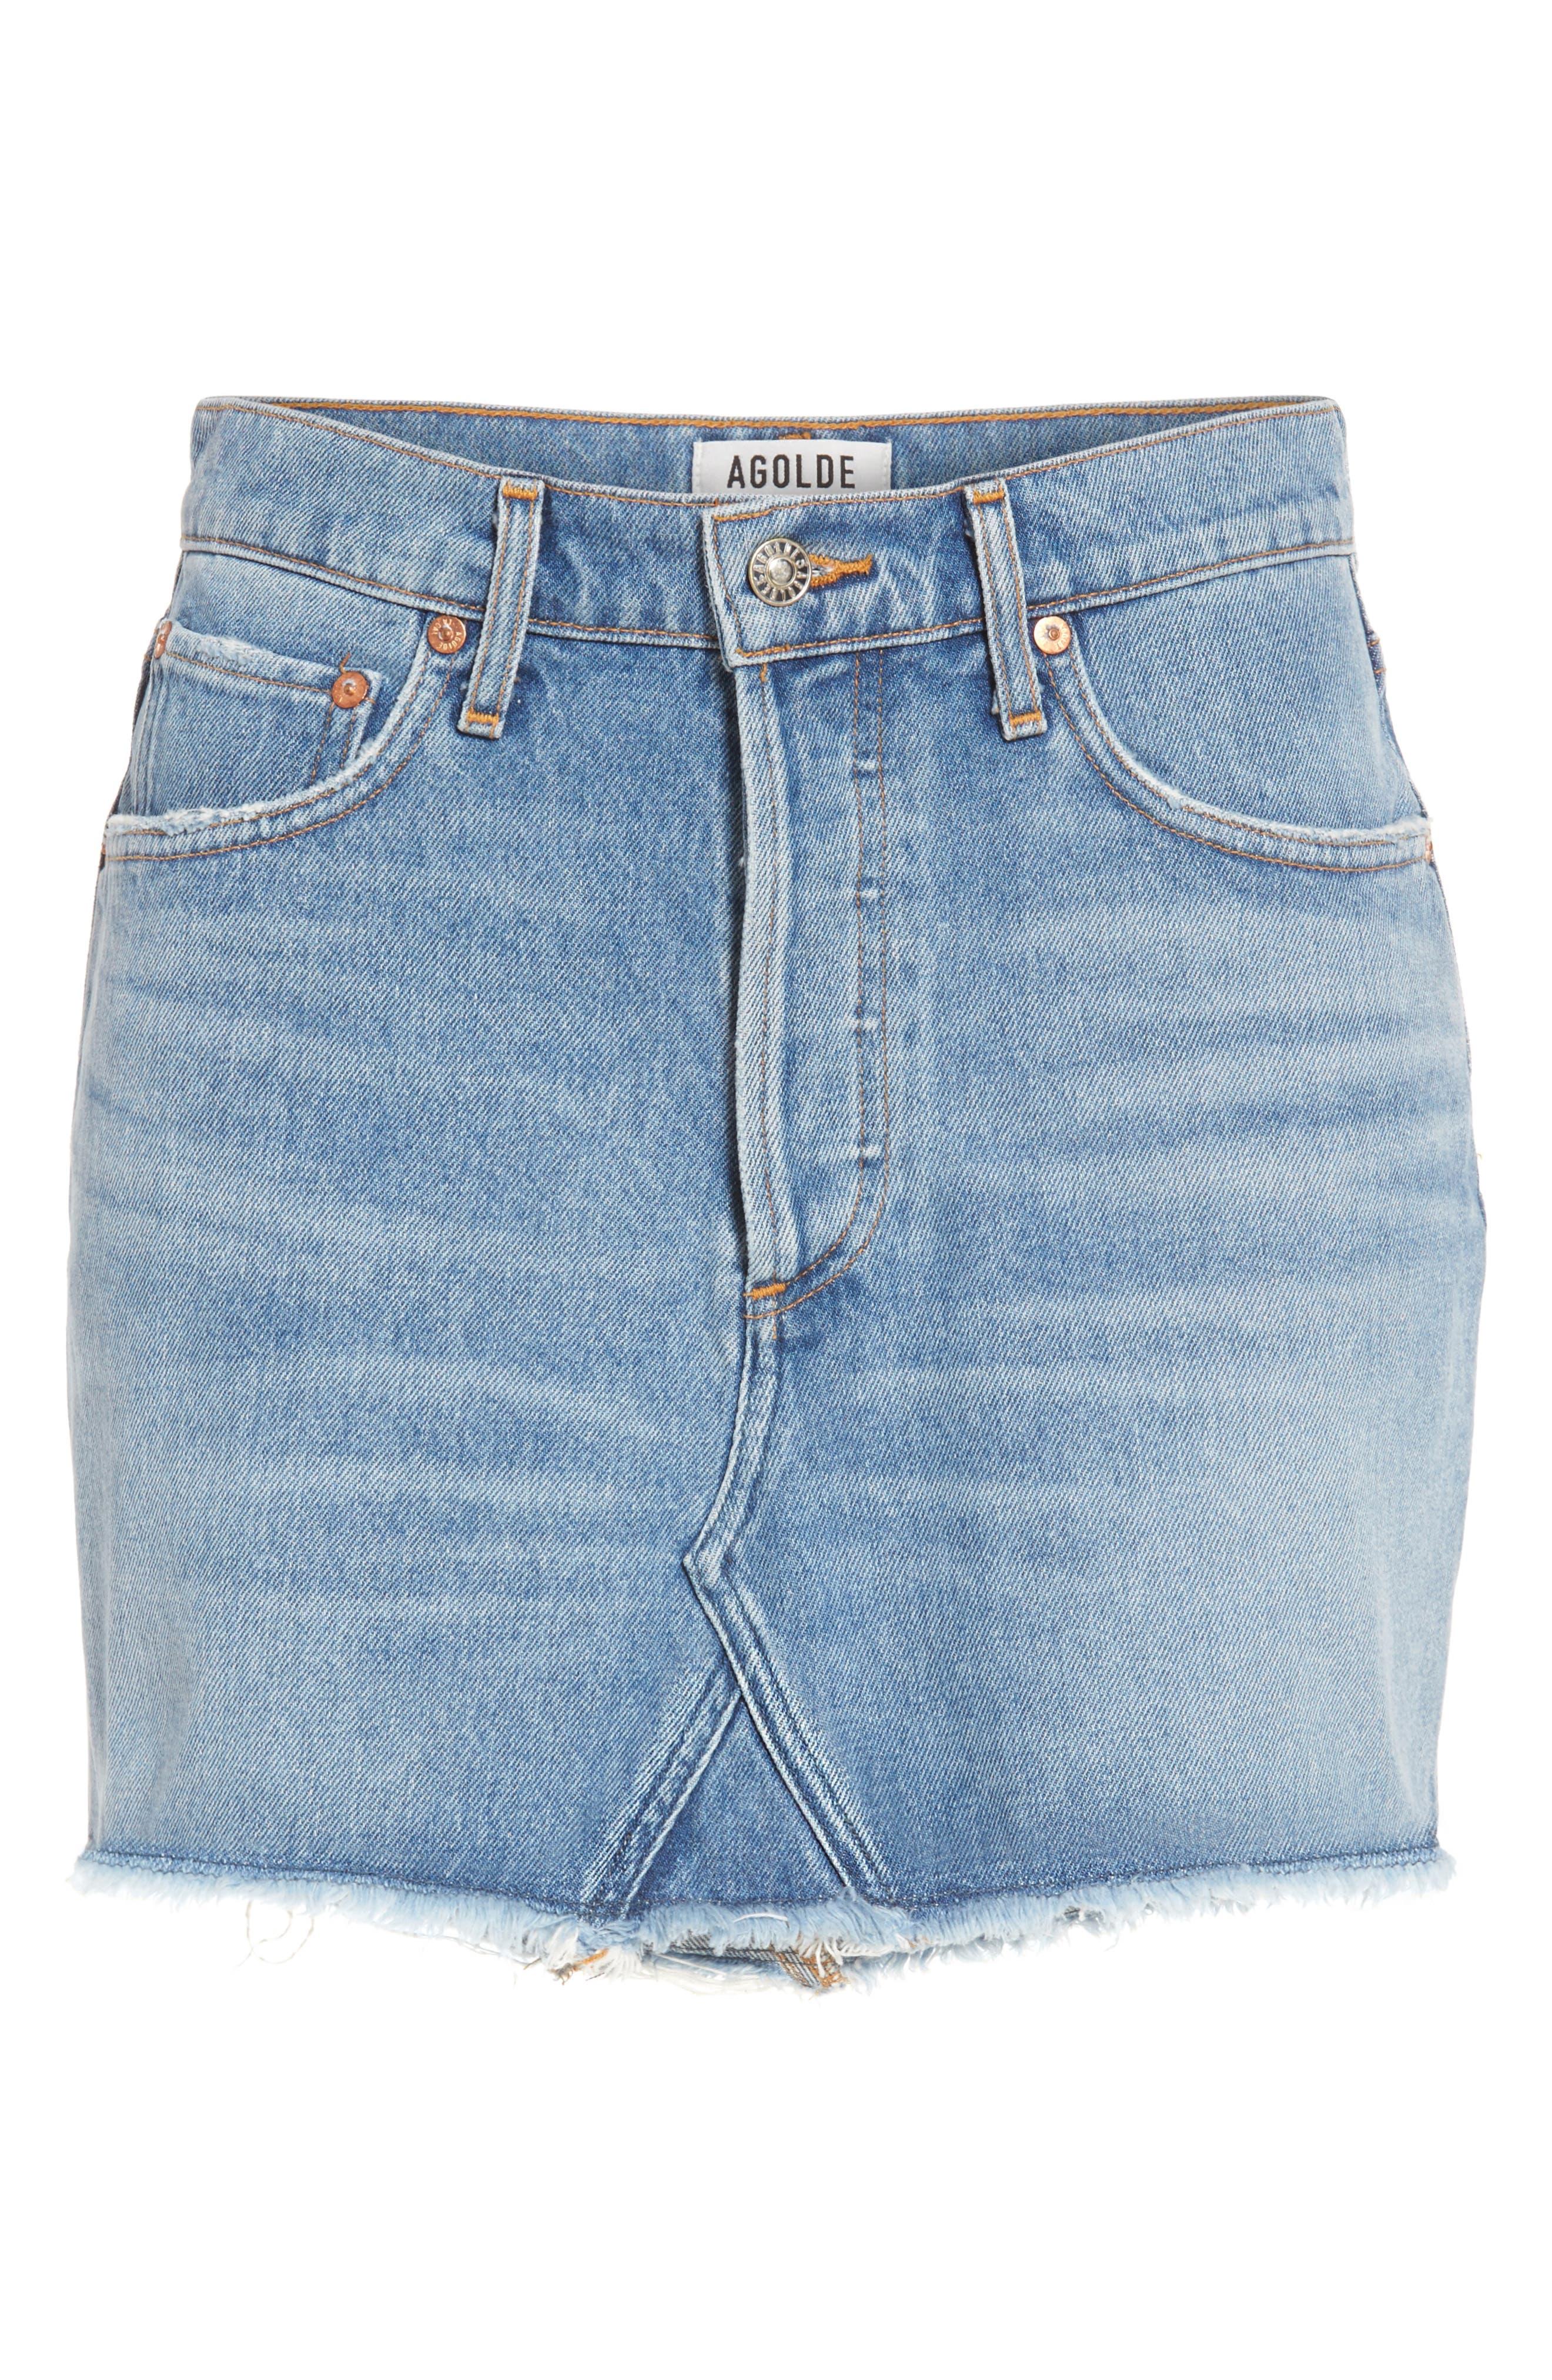 Quinn High Waist Denim Miniskirt,                             Alternate thumbnail 6, color,                             480